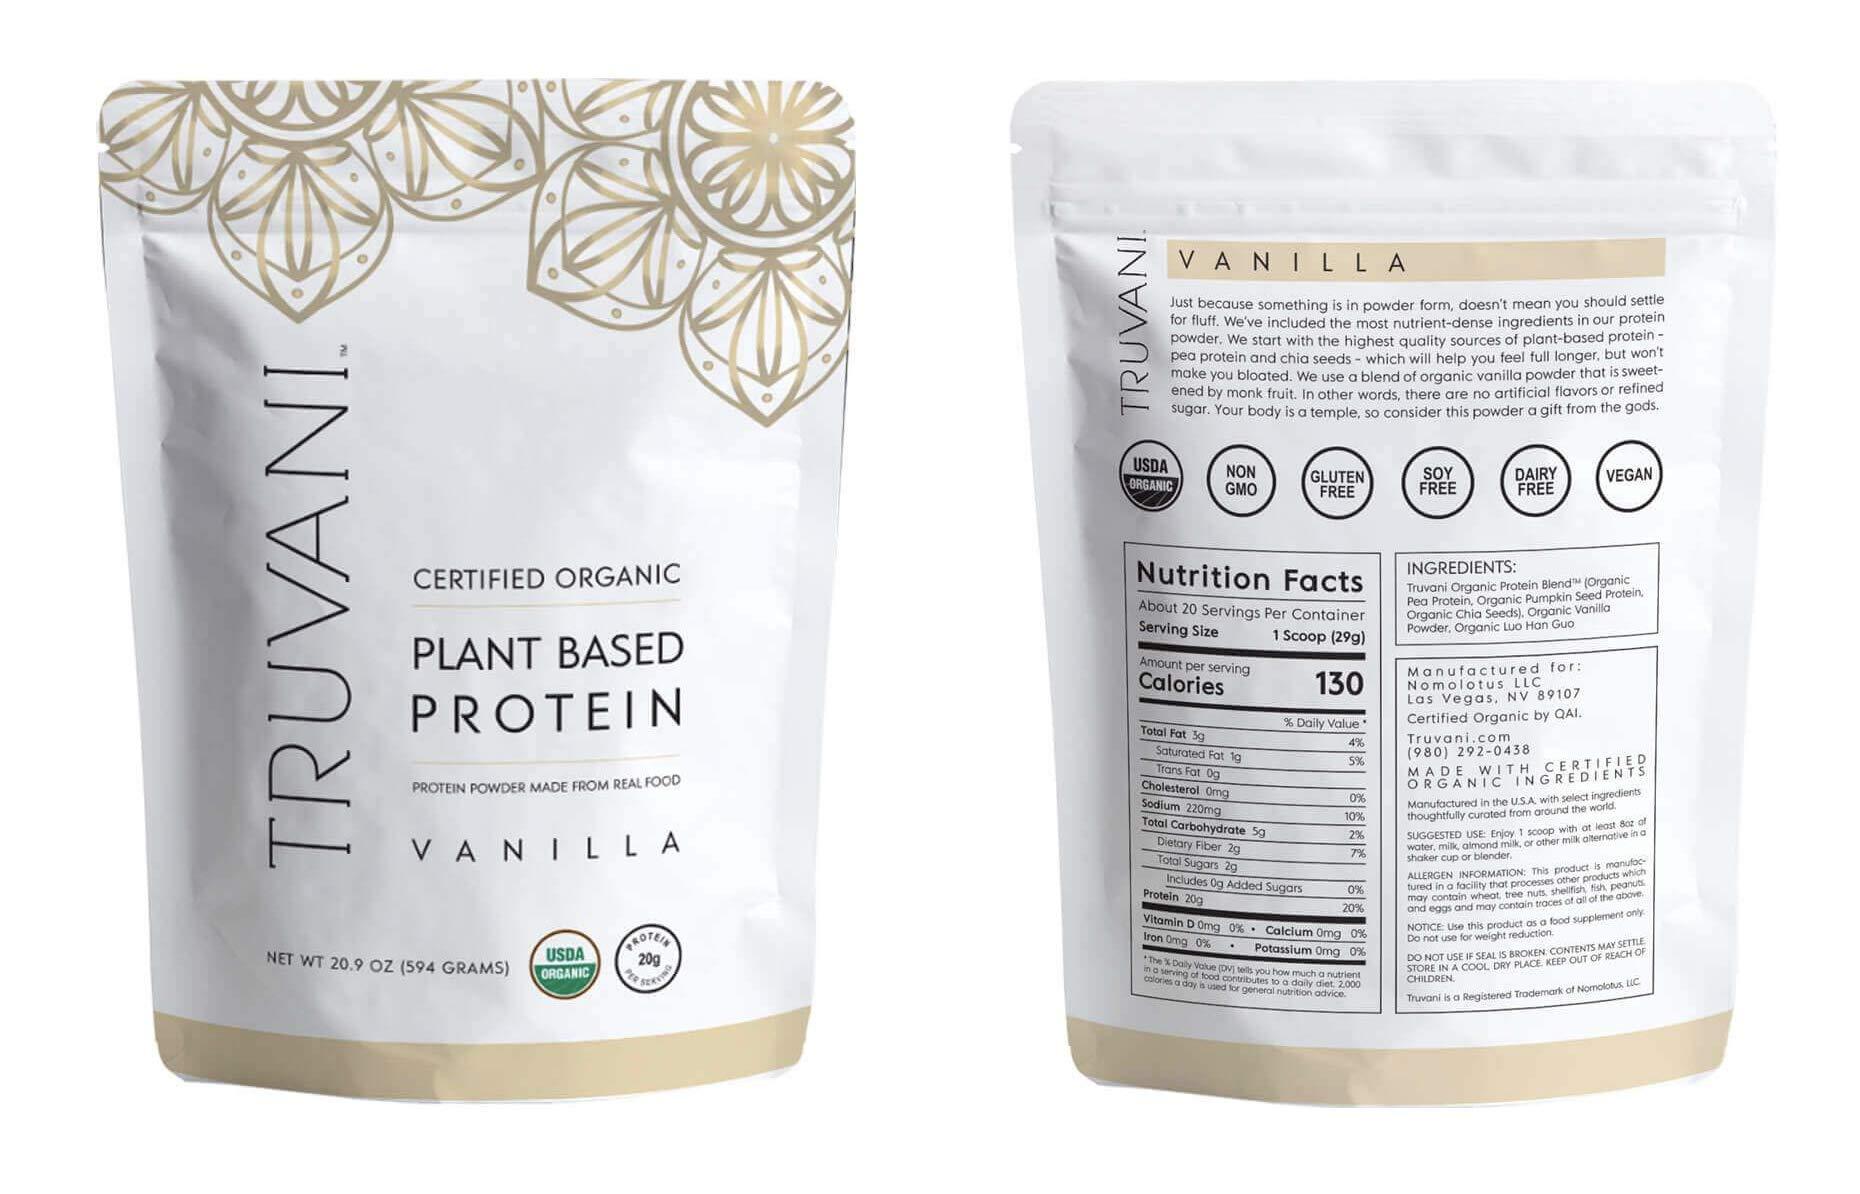 TRUVANI - Plant Based Protein Powder - USDA Certified Organic Protein Powder, Vegan, Non-GMO, Gluten Free Protein Powder   Perfect for Rebuilding & Refuelling Muscles   594 Grams - Vanilla by Truvani (Image #2)